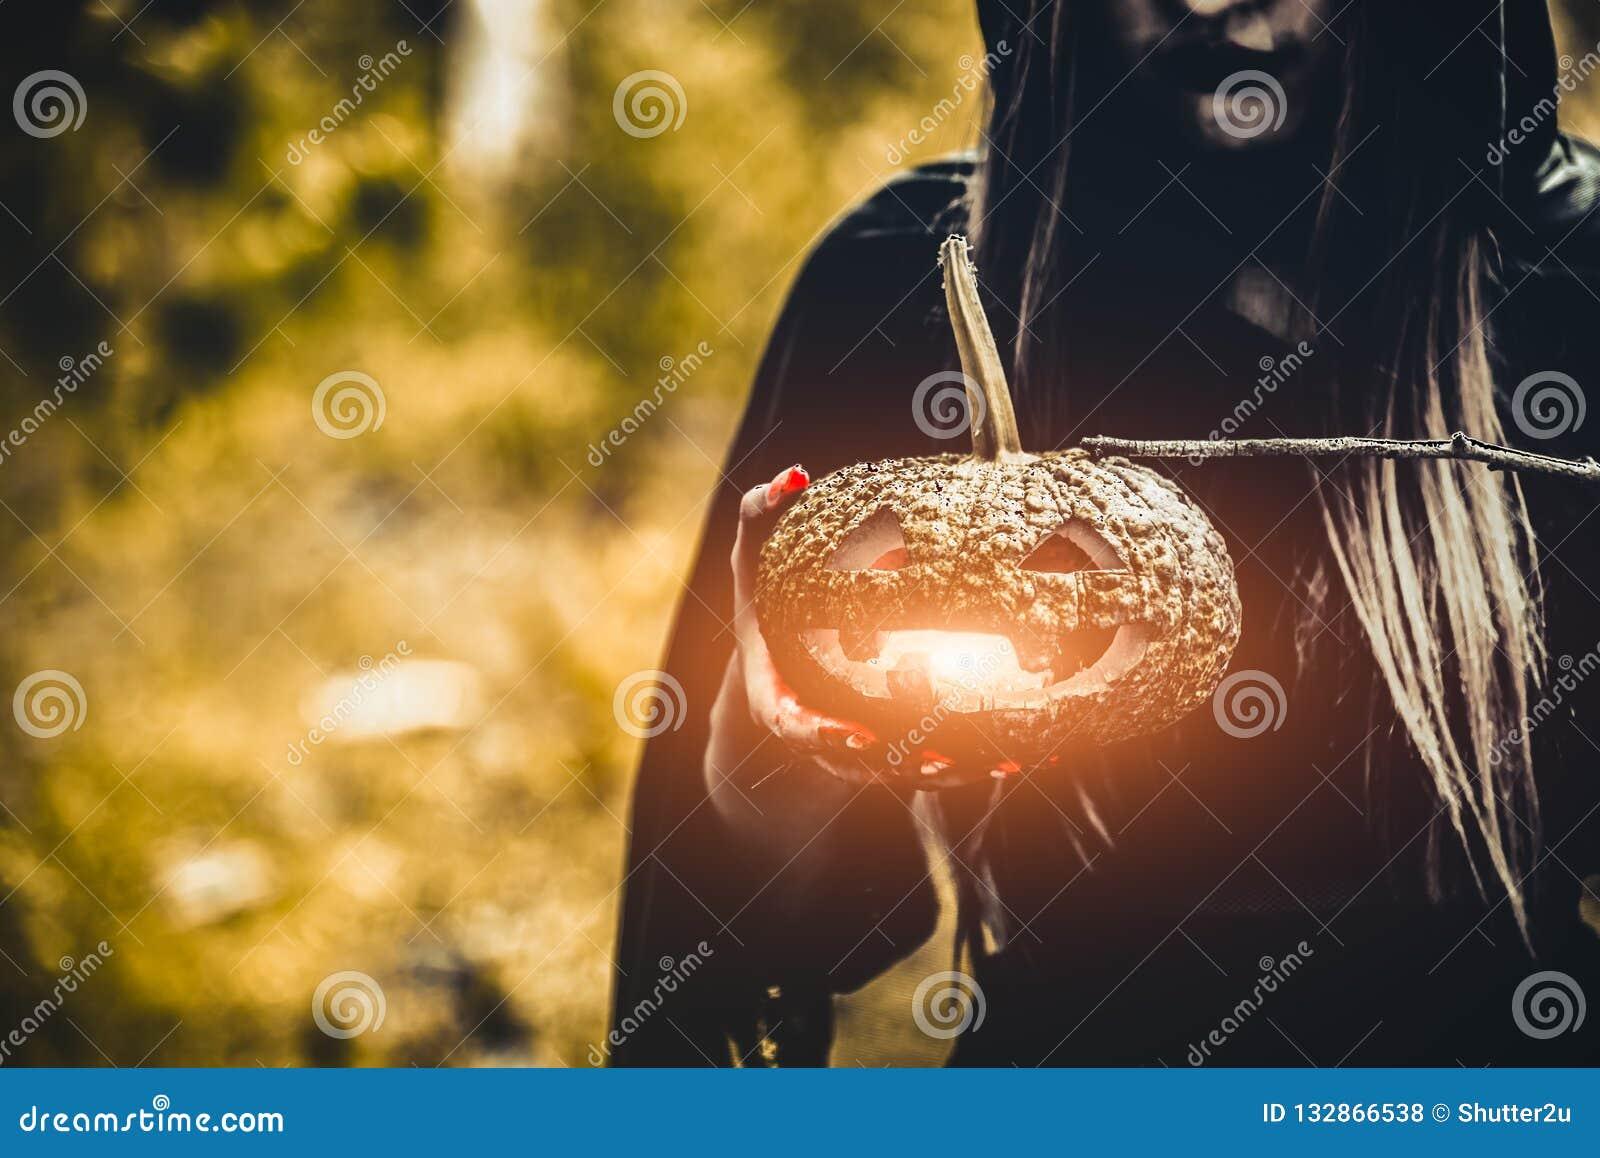 Lanterna da abóbora na mão da bruxa Abóbora da terra arrendada da mulher adulta na obscuridade